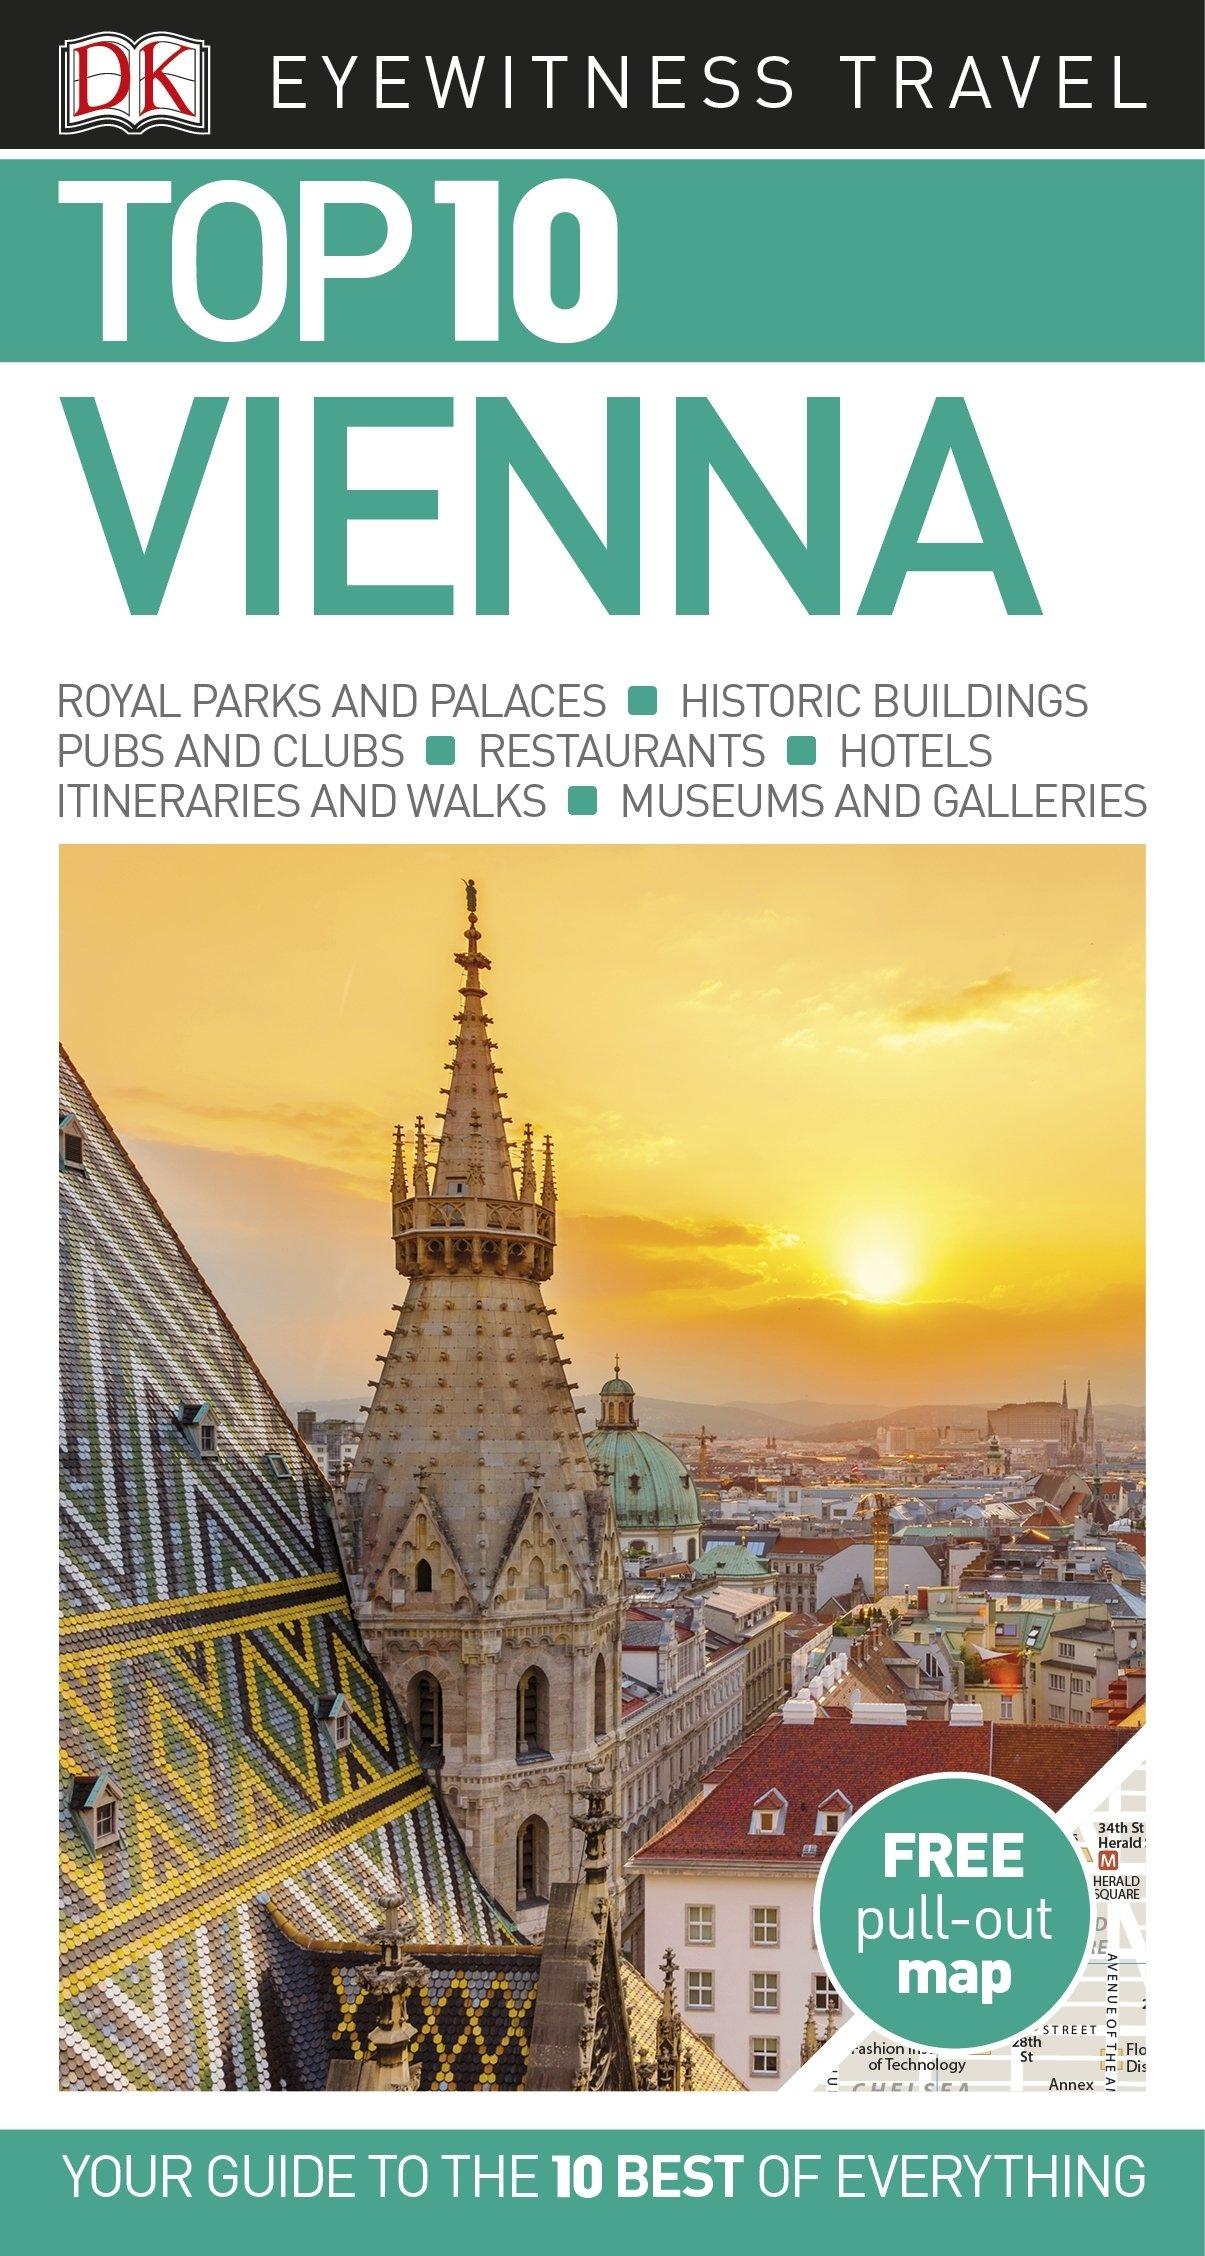 Top 10 Vienna  2019  DK Eyewitness Travel Guide